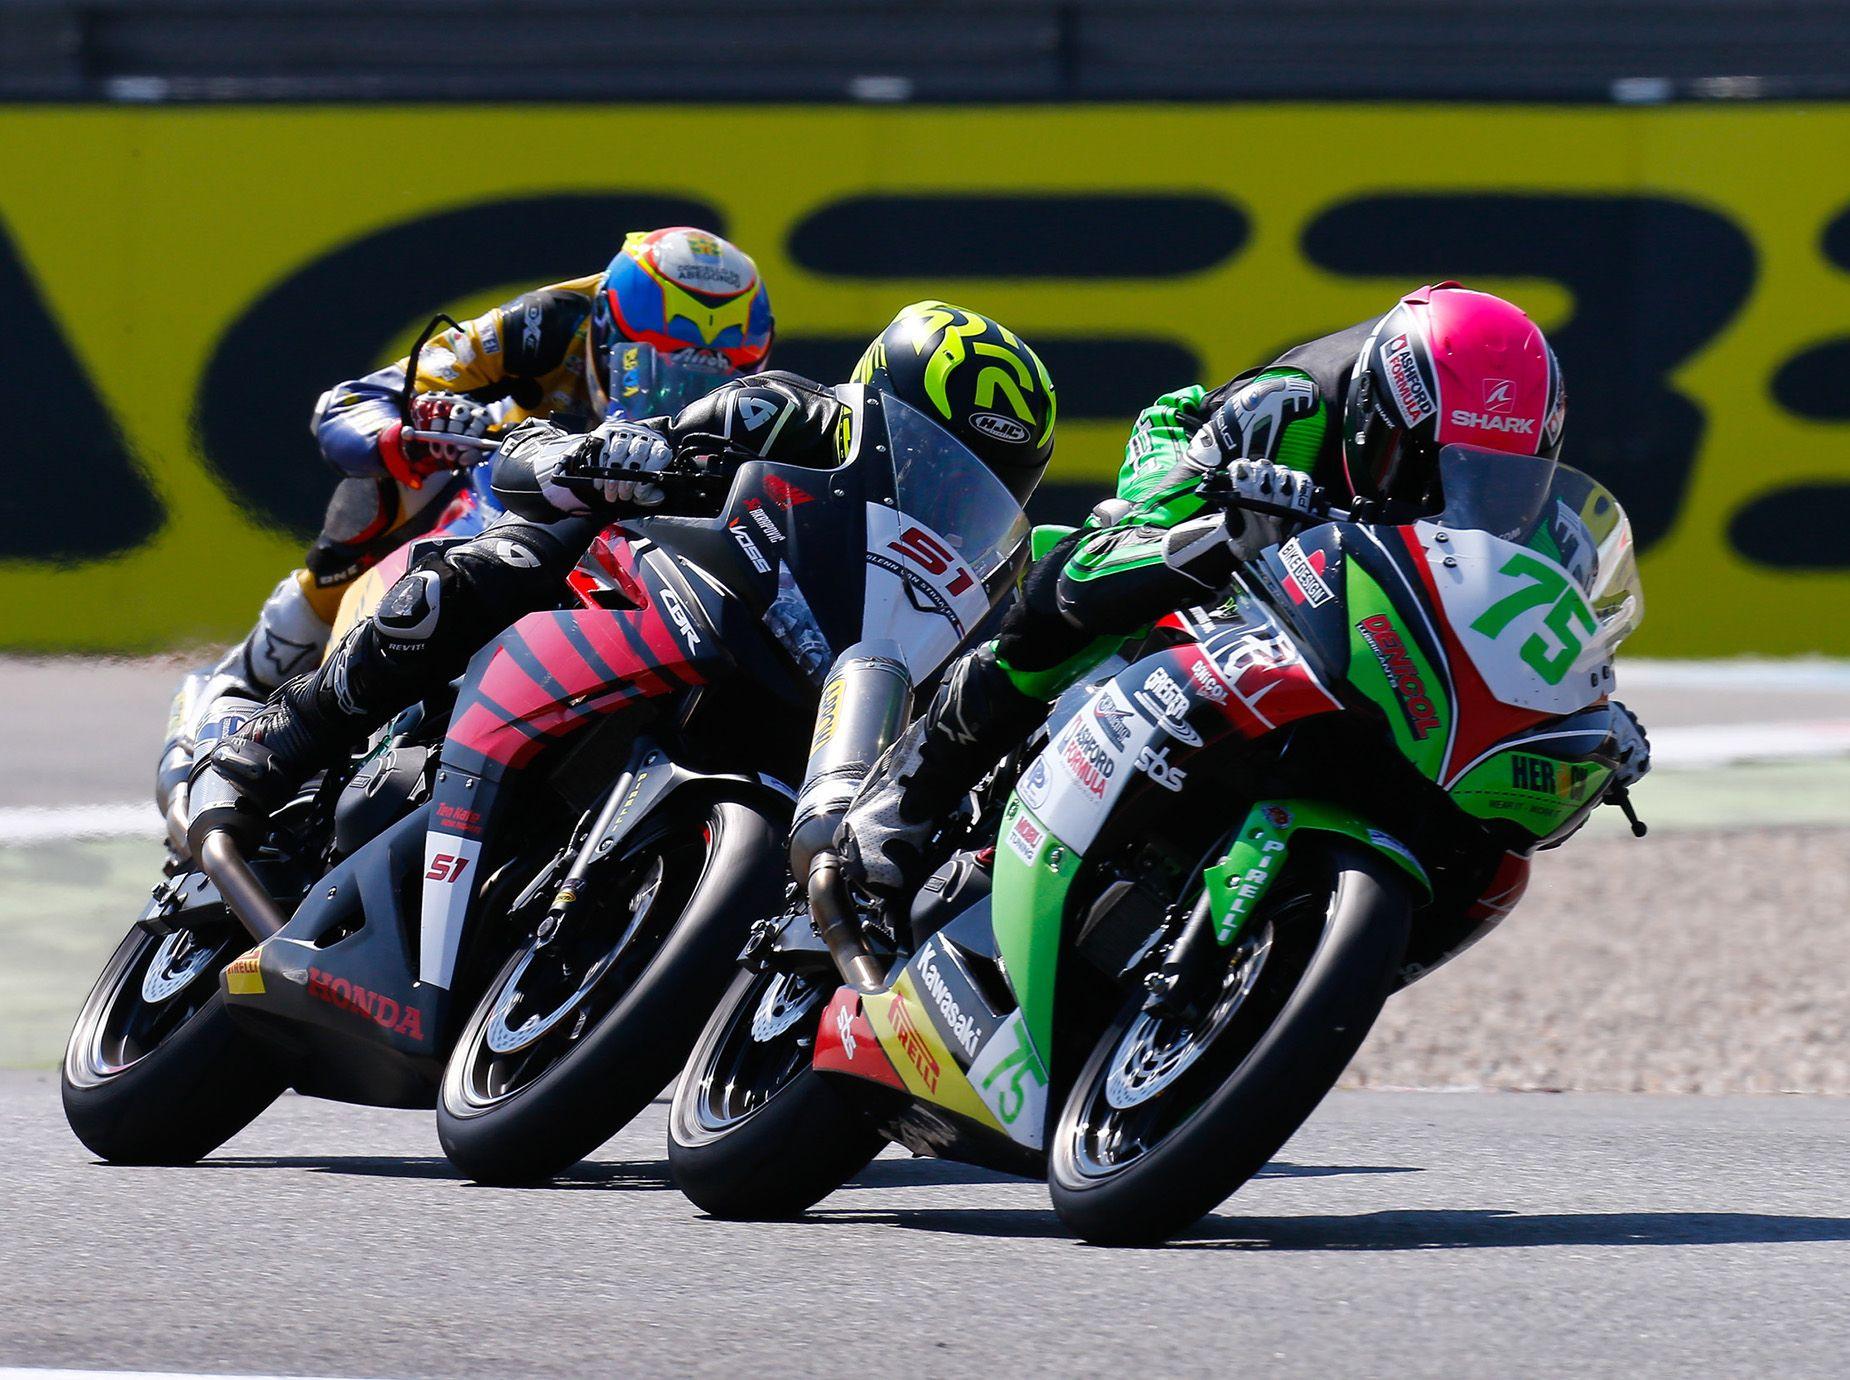 Worldssp300 Scott Deroue Secures Home Victory In Sensational Worldssp300 Race Http Superbike News Co Uk Wordpress Wor Motorcycle Racing Racing Road Racing